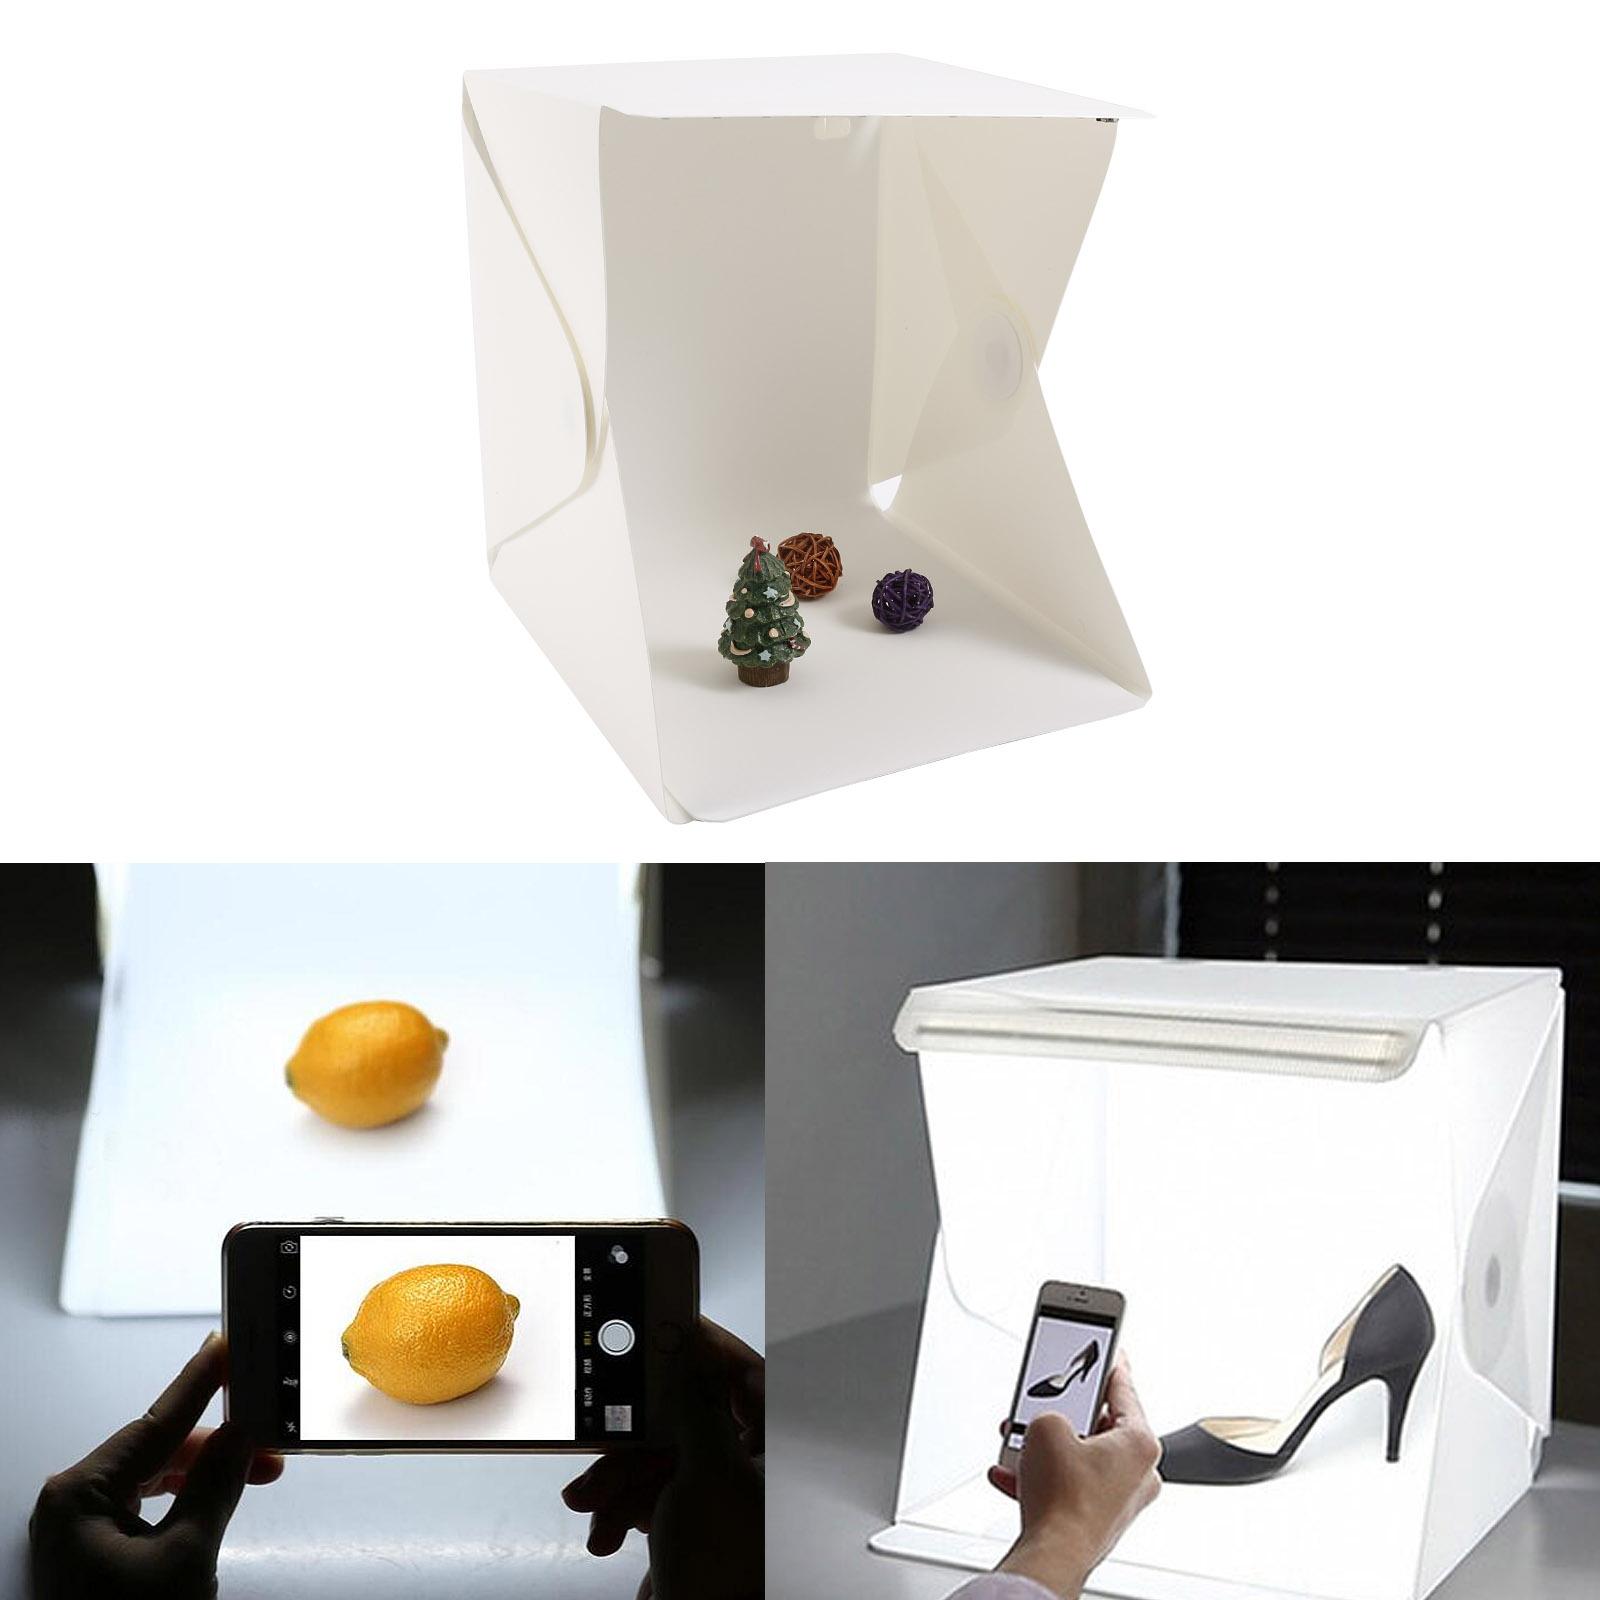 Light Room Photo Studio Photography Lighting Tent Kit: Foldable Mini Photo Studio Light Tent Kit Portable Room